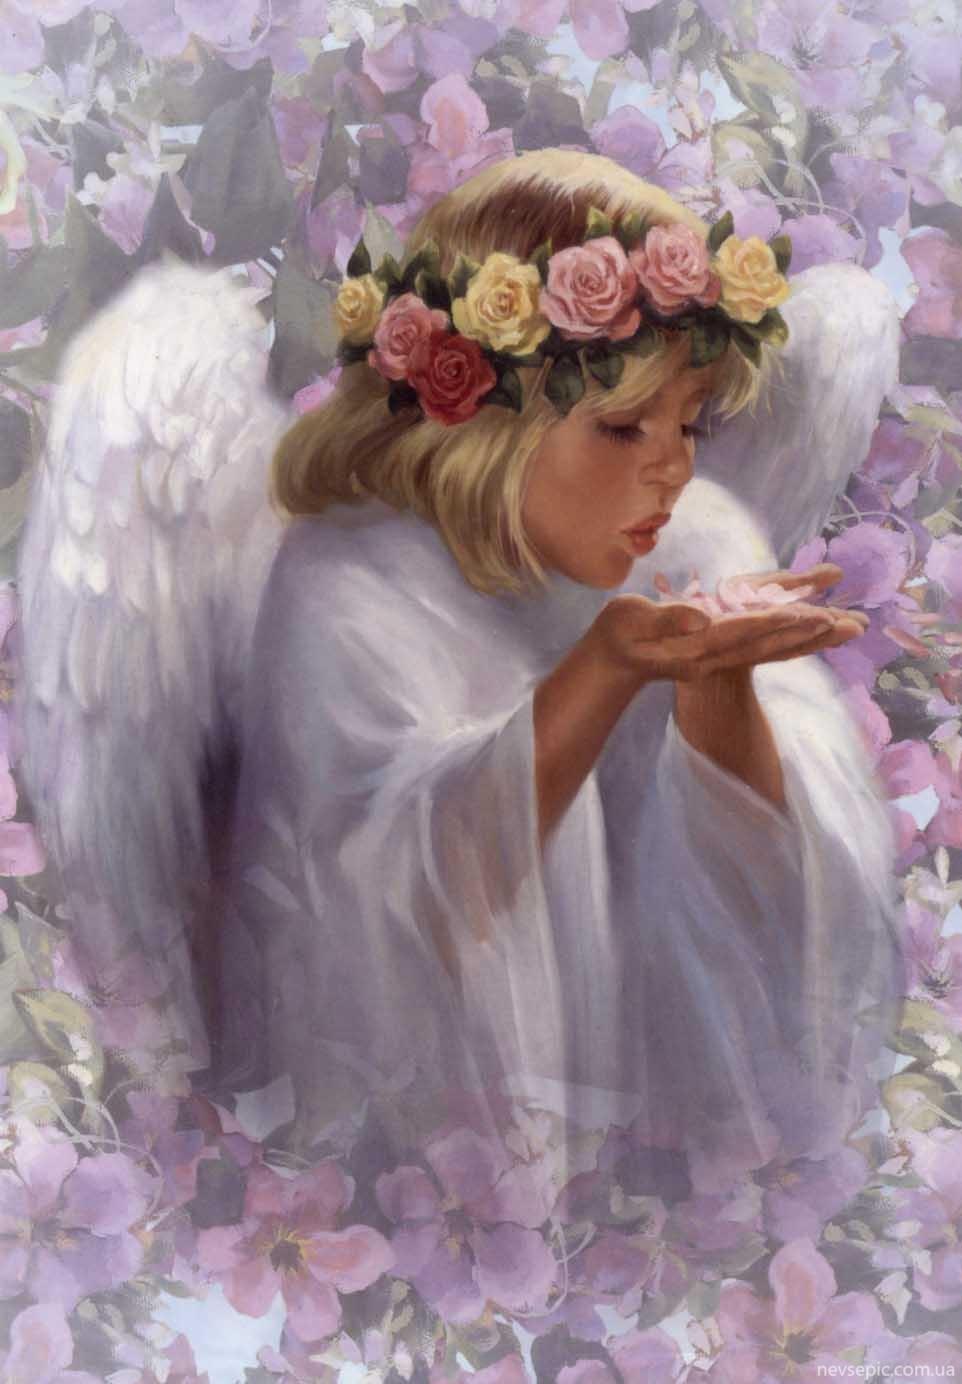 Фото девушка ангел с цветами